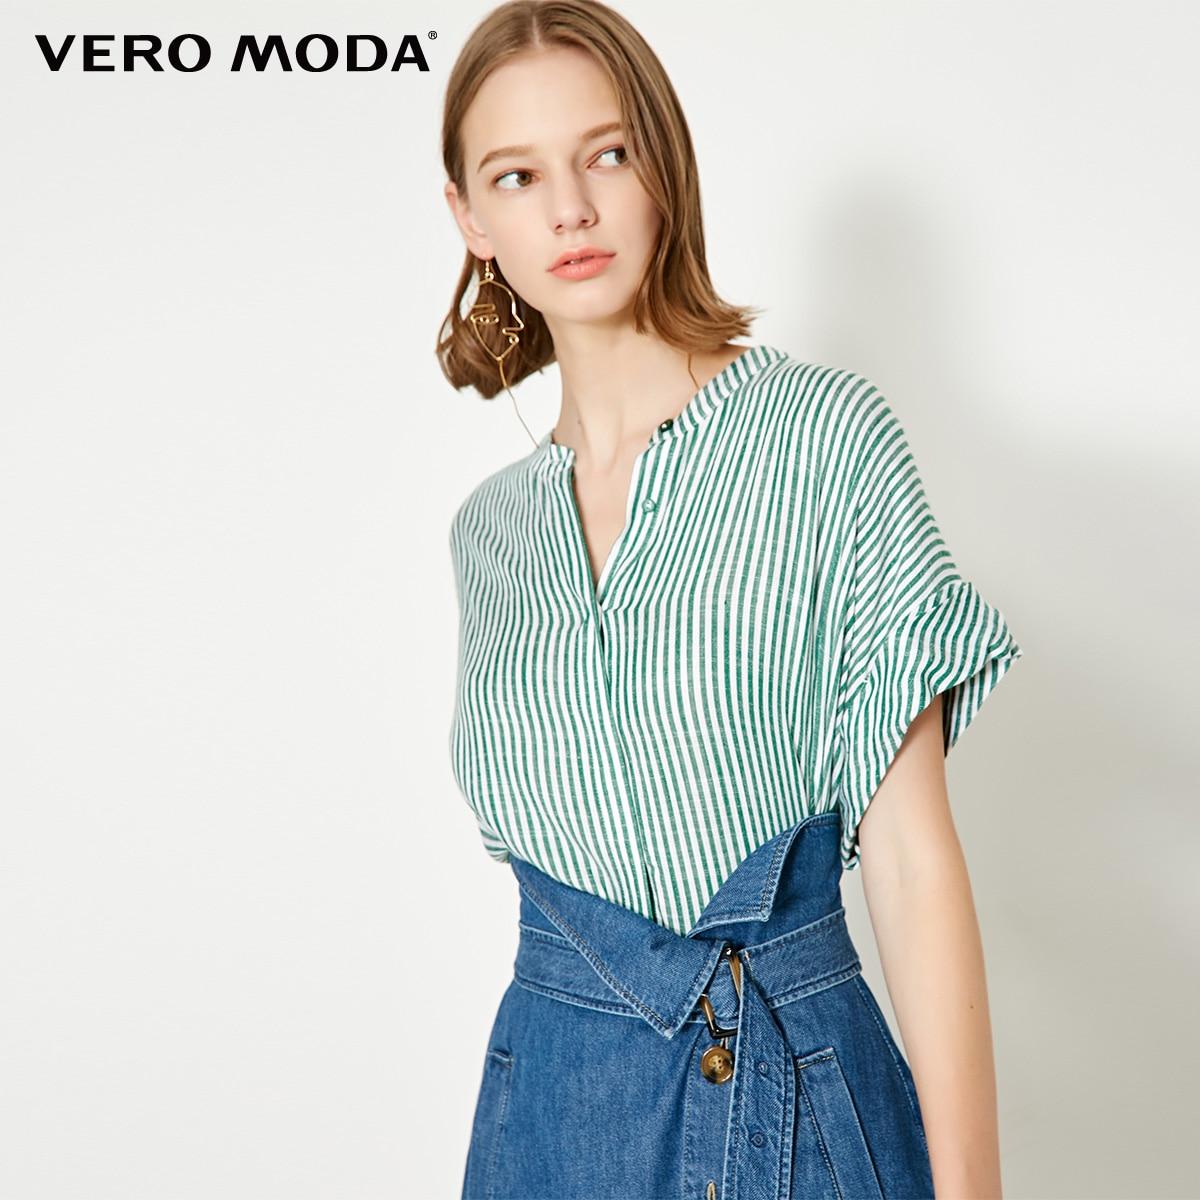 Vero Moda Women's Loose Fit Striped Short-sleeved Shirt | 319204501